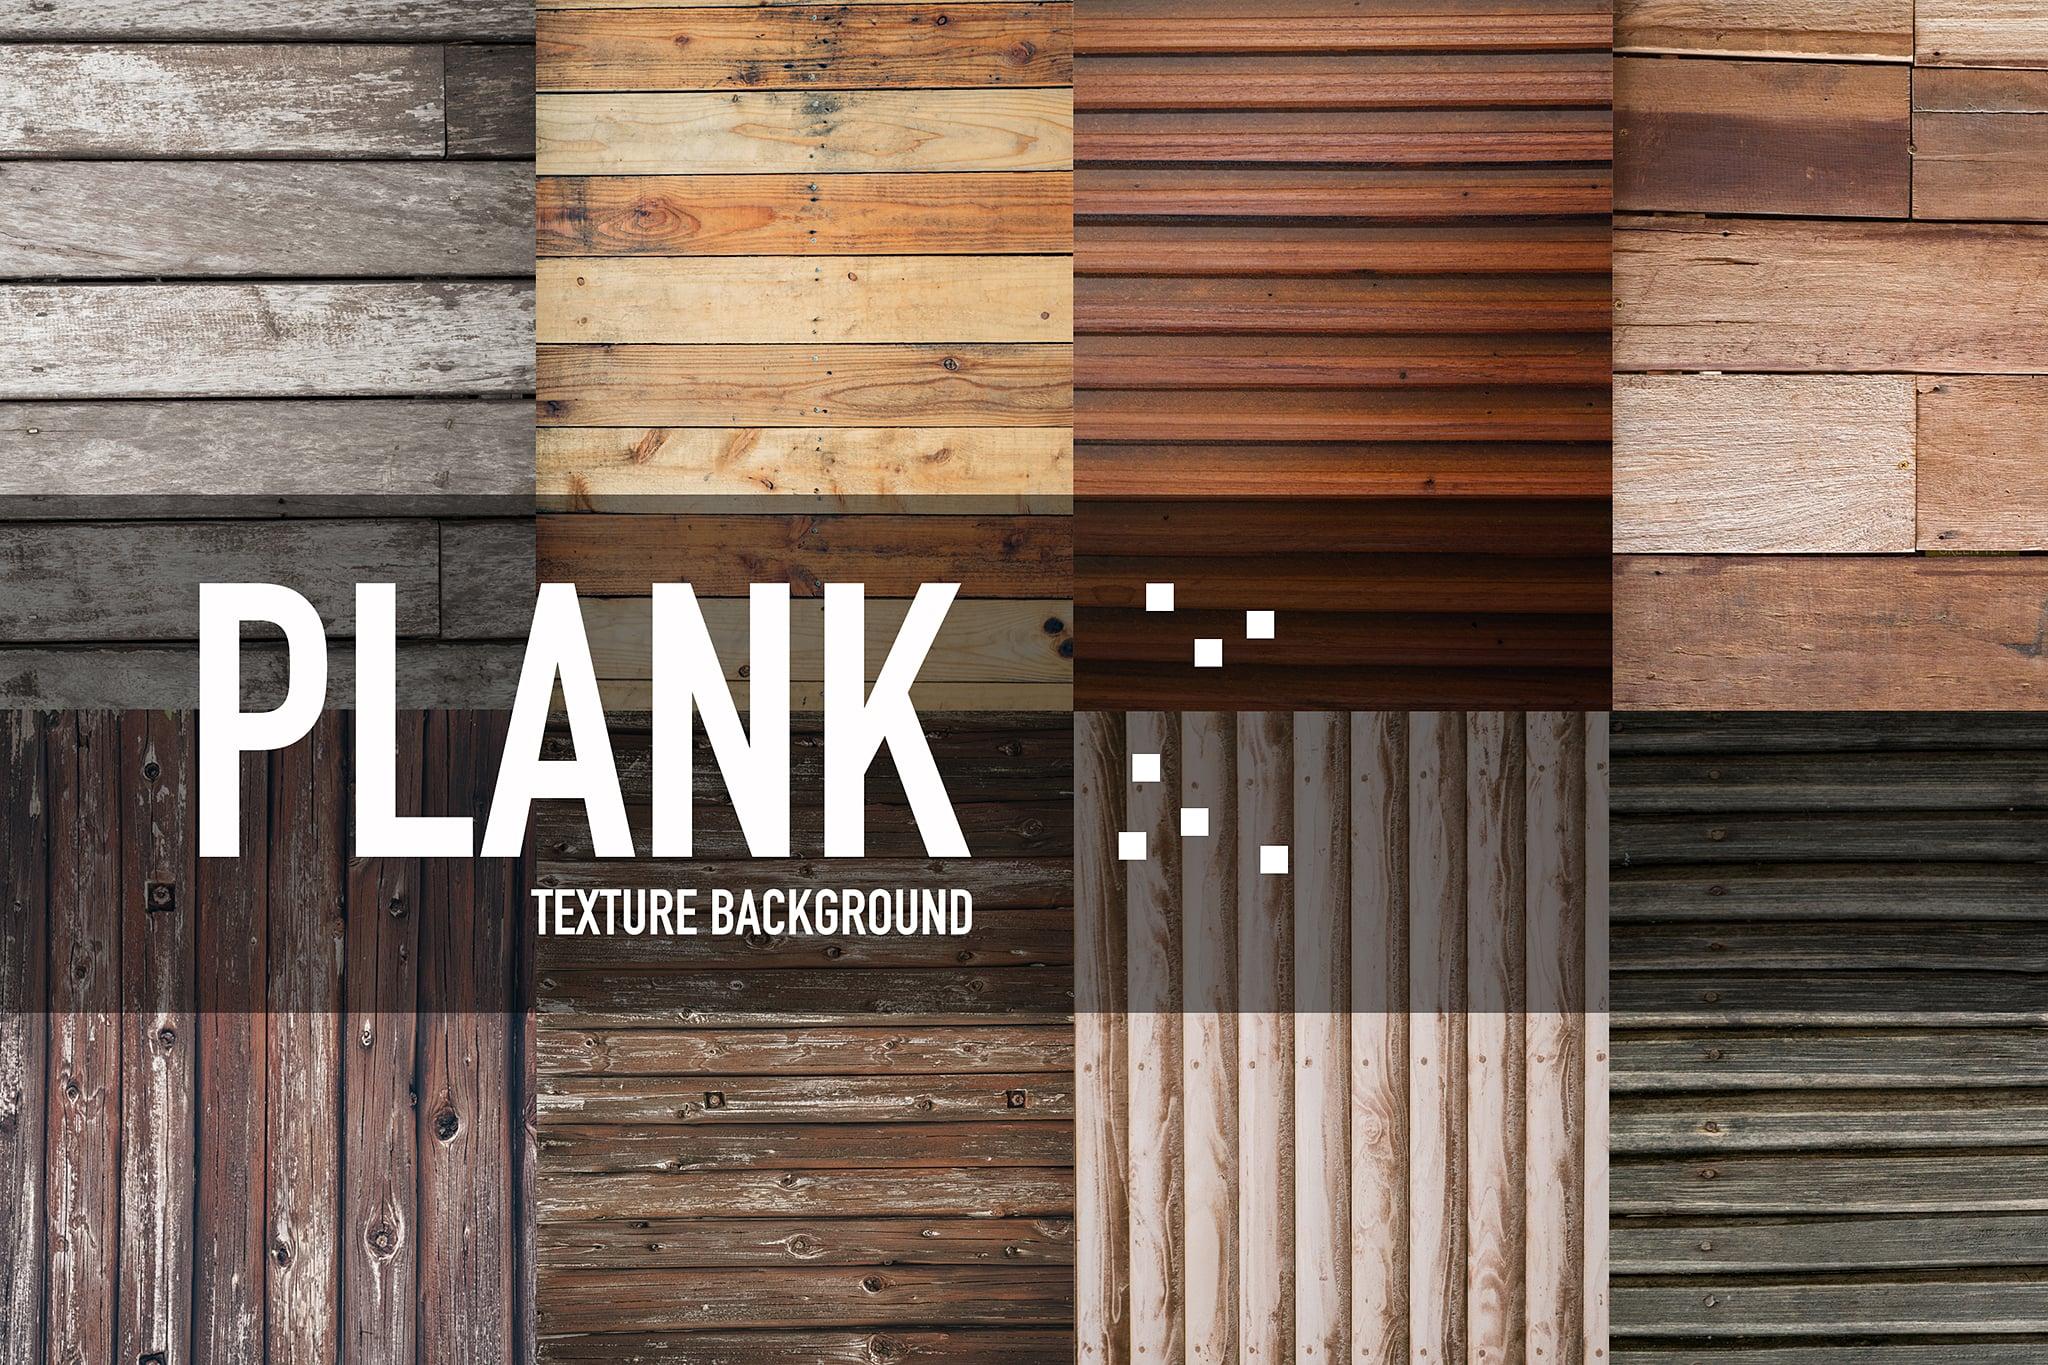 Wood texture background, wood planks.